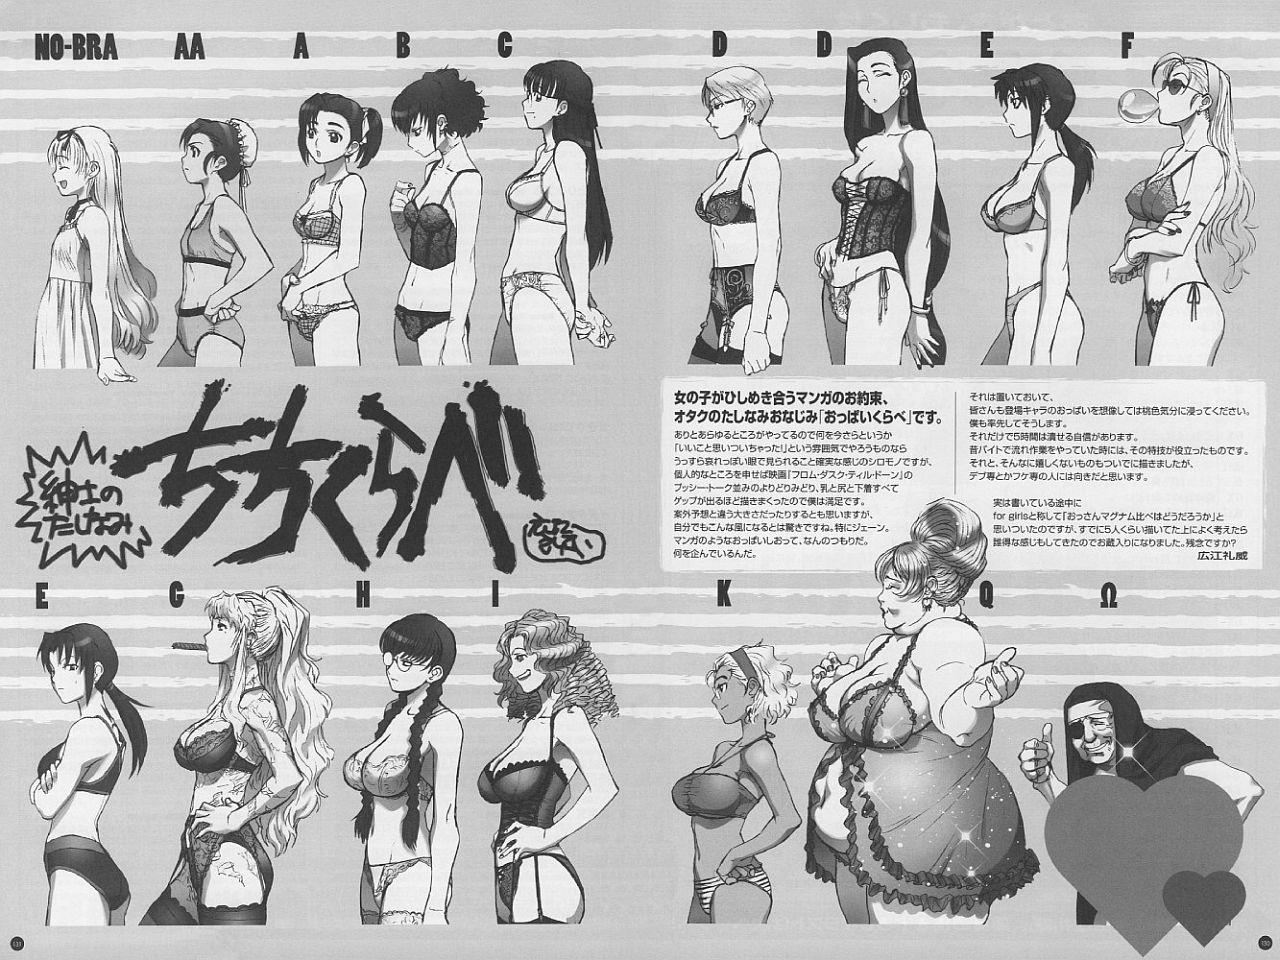 kais general again nipples damn thread image xxxviii there random